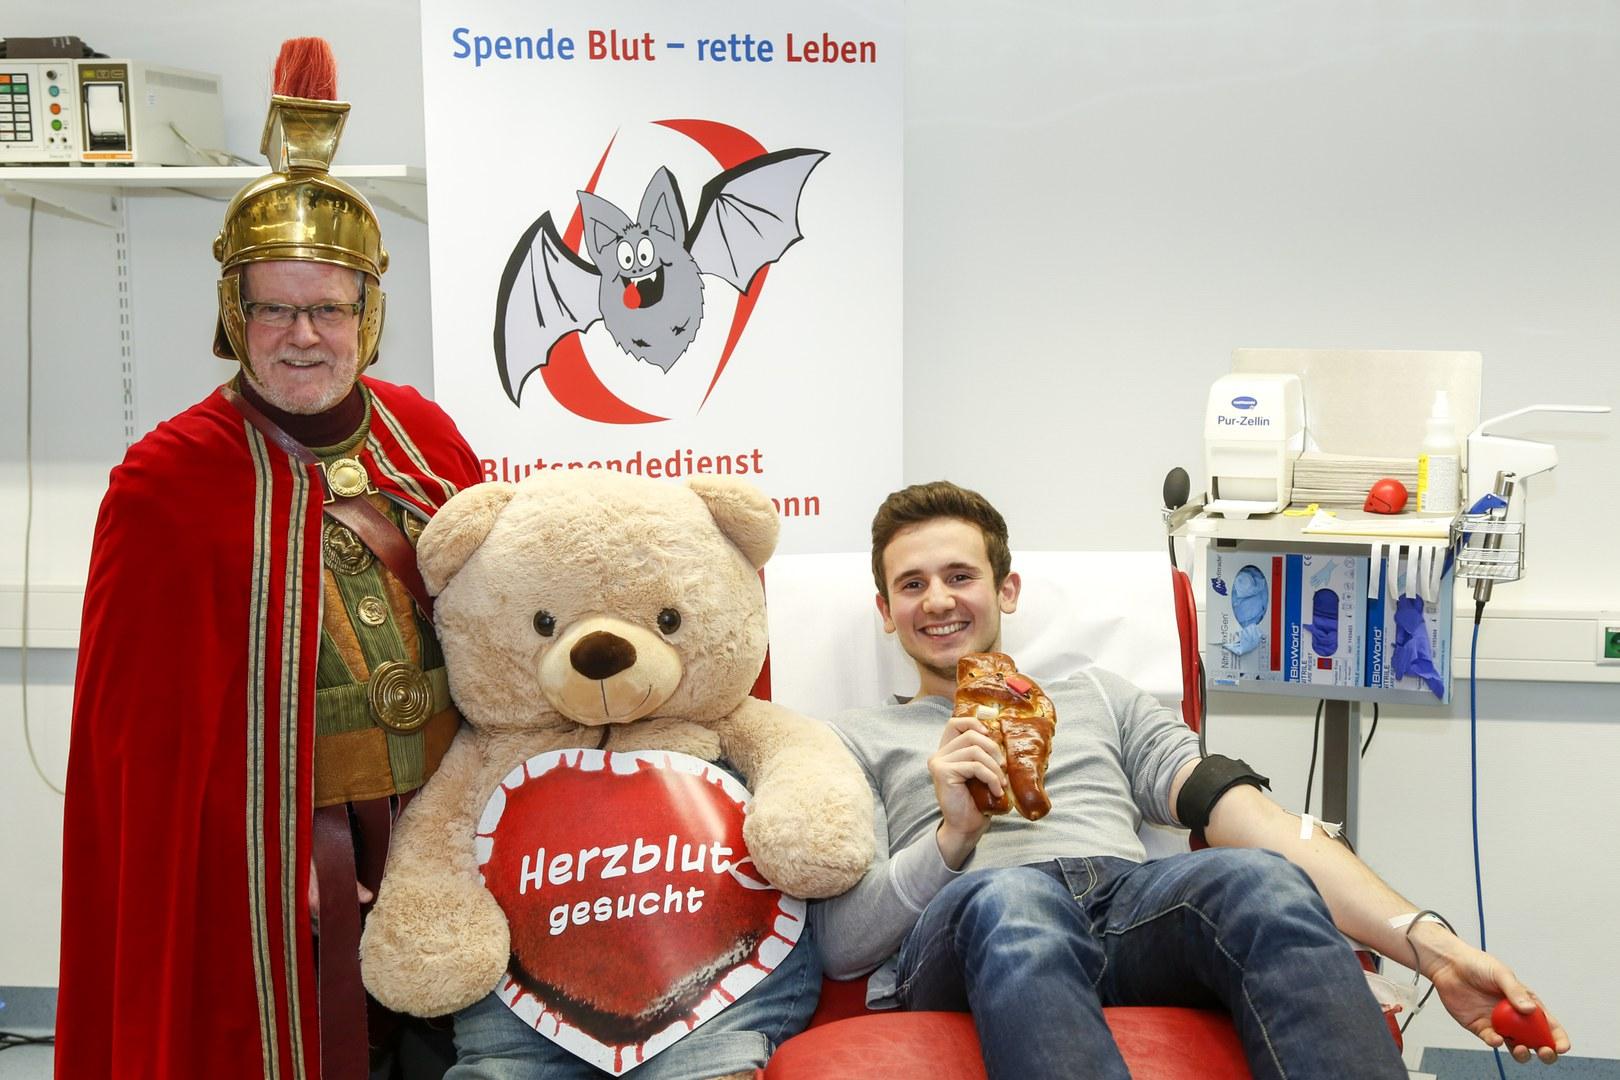 Blutspendedienst: